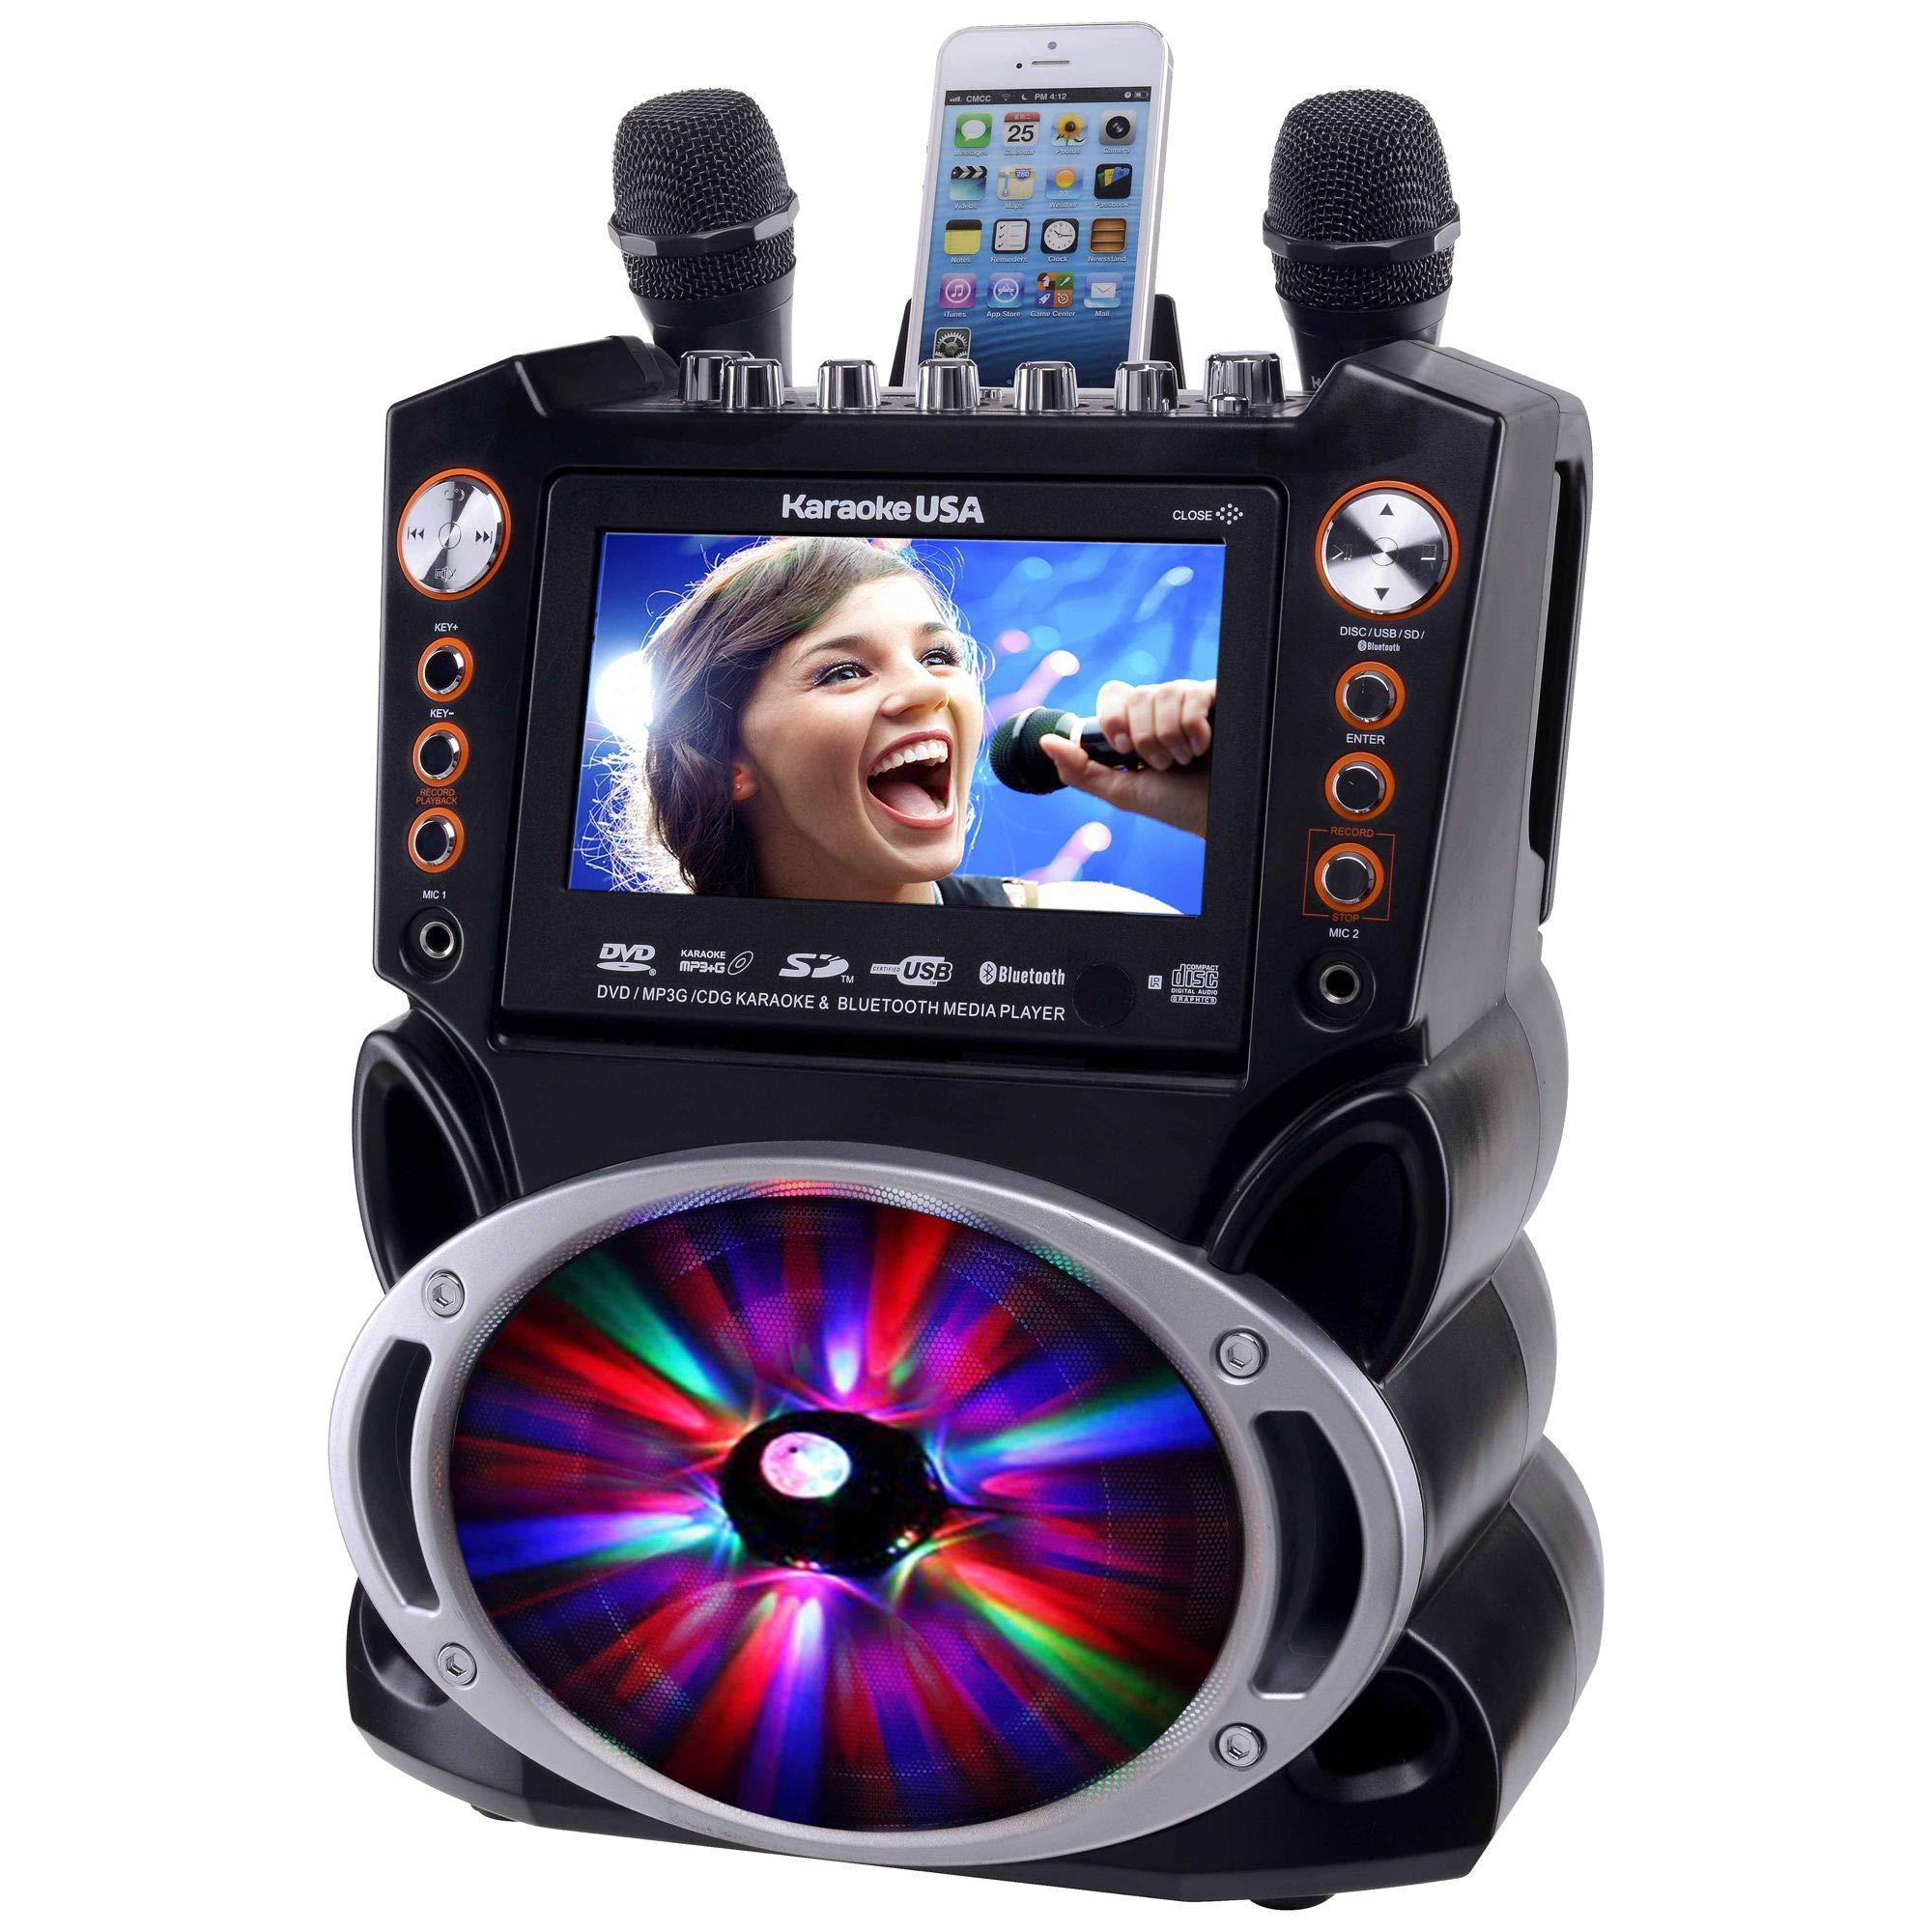 Karaoke USA GF846 DVD/CDG/MP3G Karaoke Machine with 7'' TFT Color Screen, Record, Bluetooth and LED Sync Lights by Karaoke USA (Image #2)